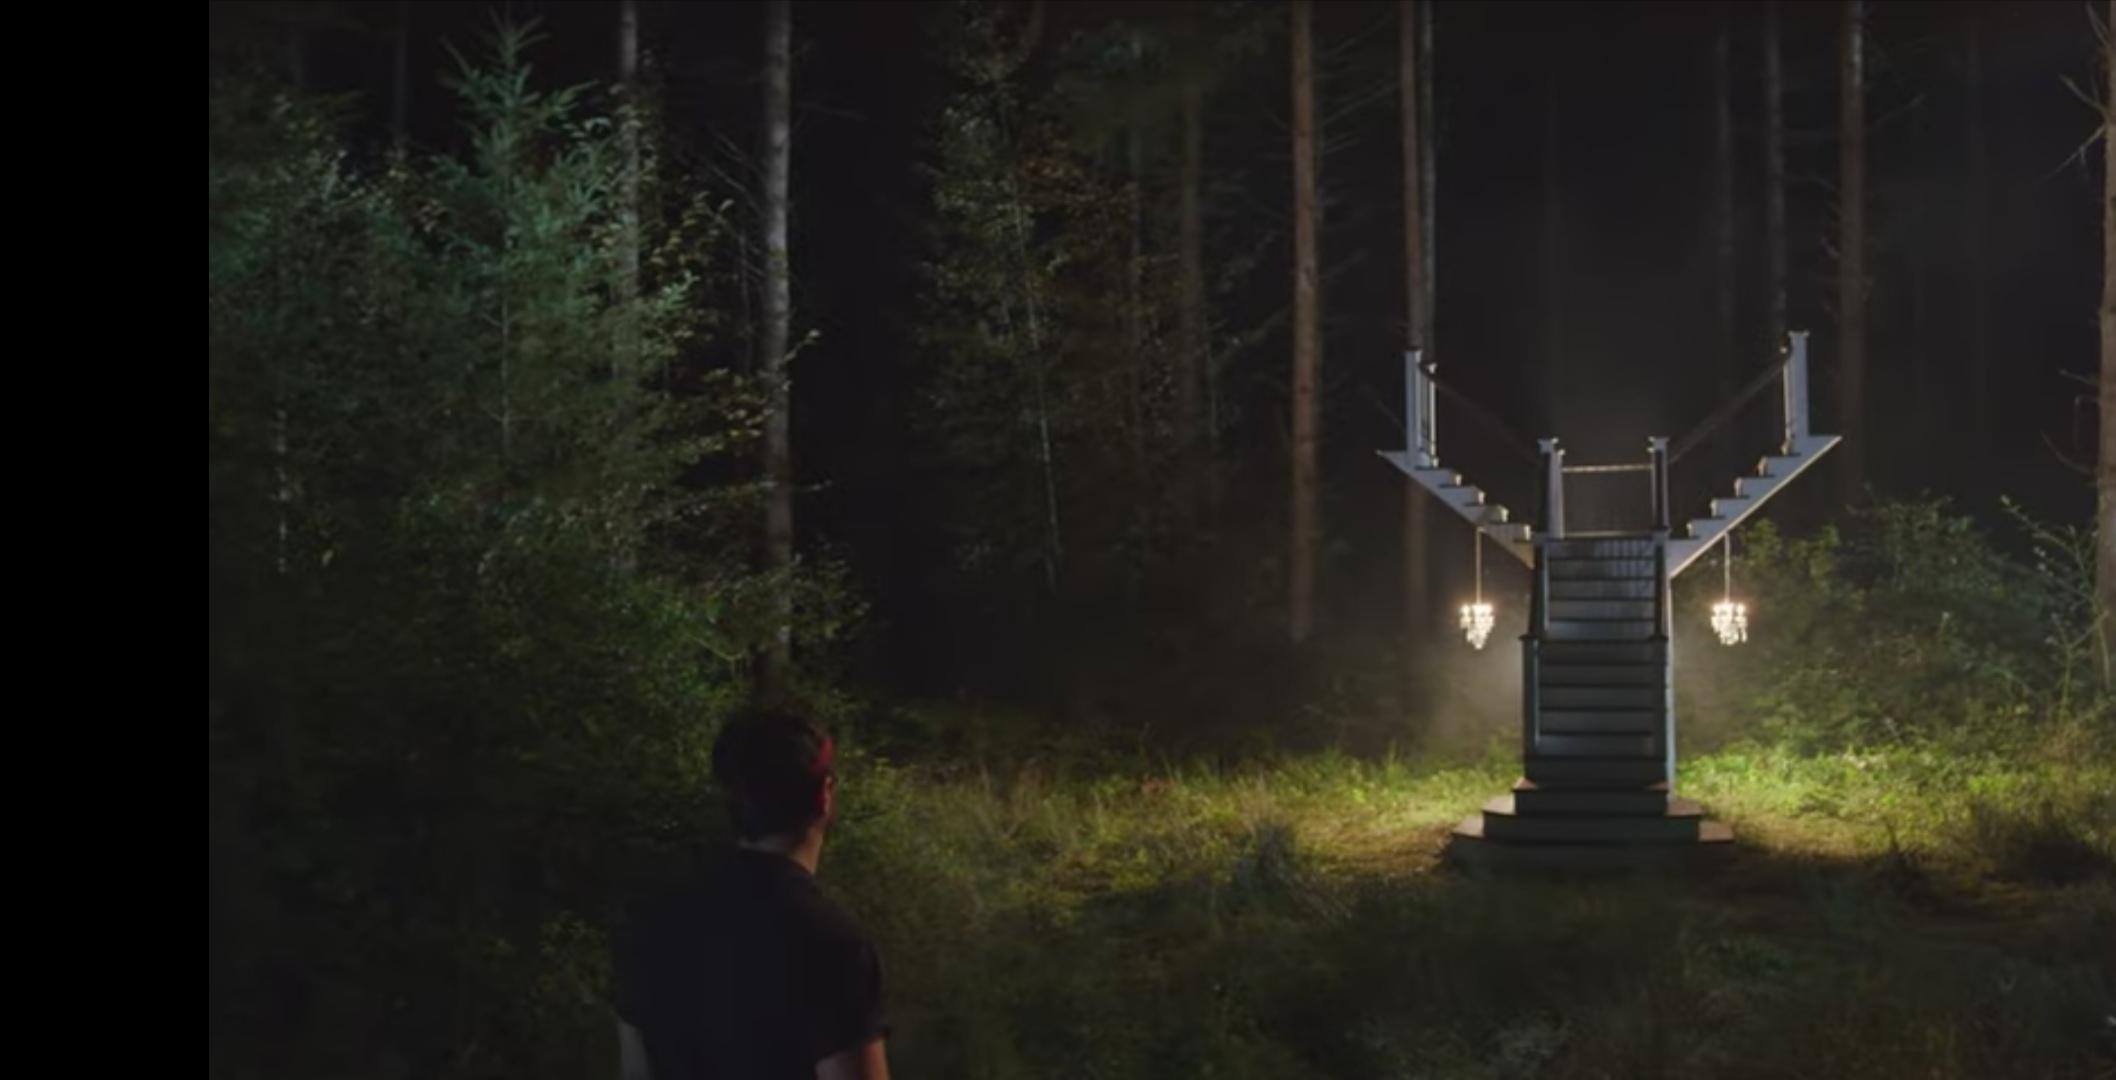 [NEWS] Il trailer dell'horror boschivo The Stairs